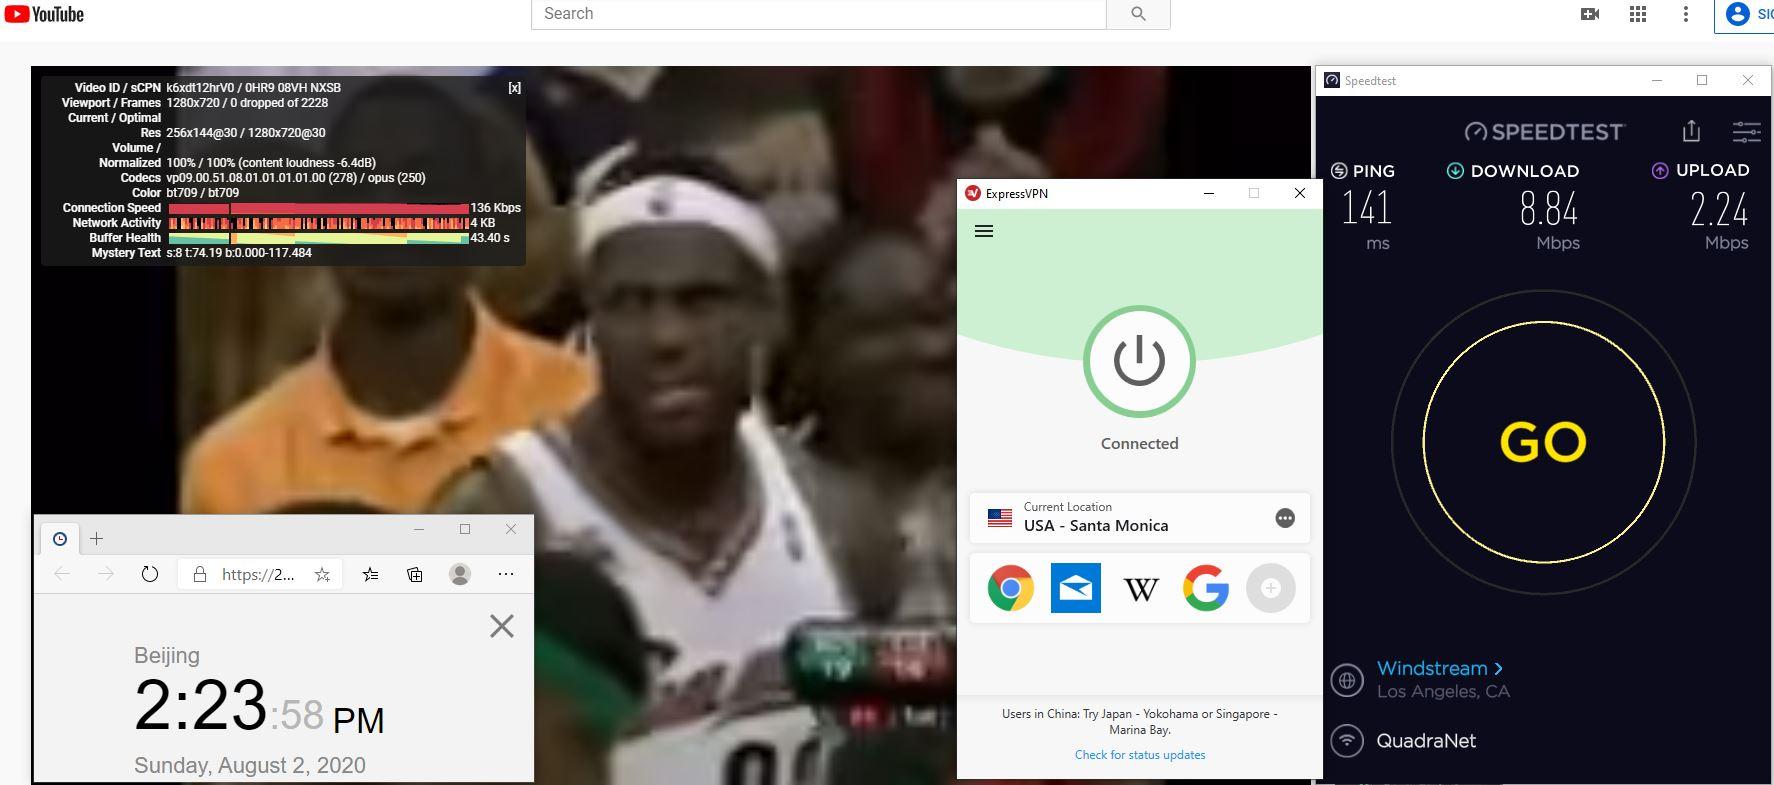 Windows10 ExpressVPN IKEv2协议 USA - Santa Monica 中国VPN 翻墙 科学上网 翻墙速度测试 - 20200802